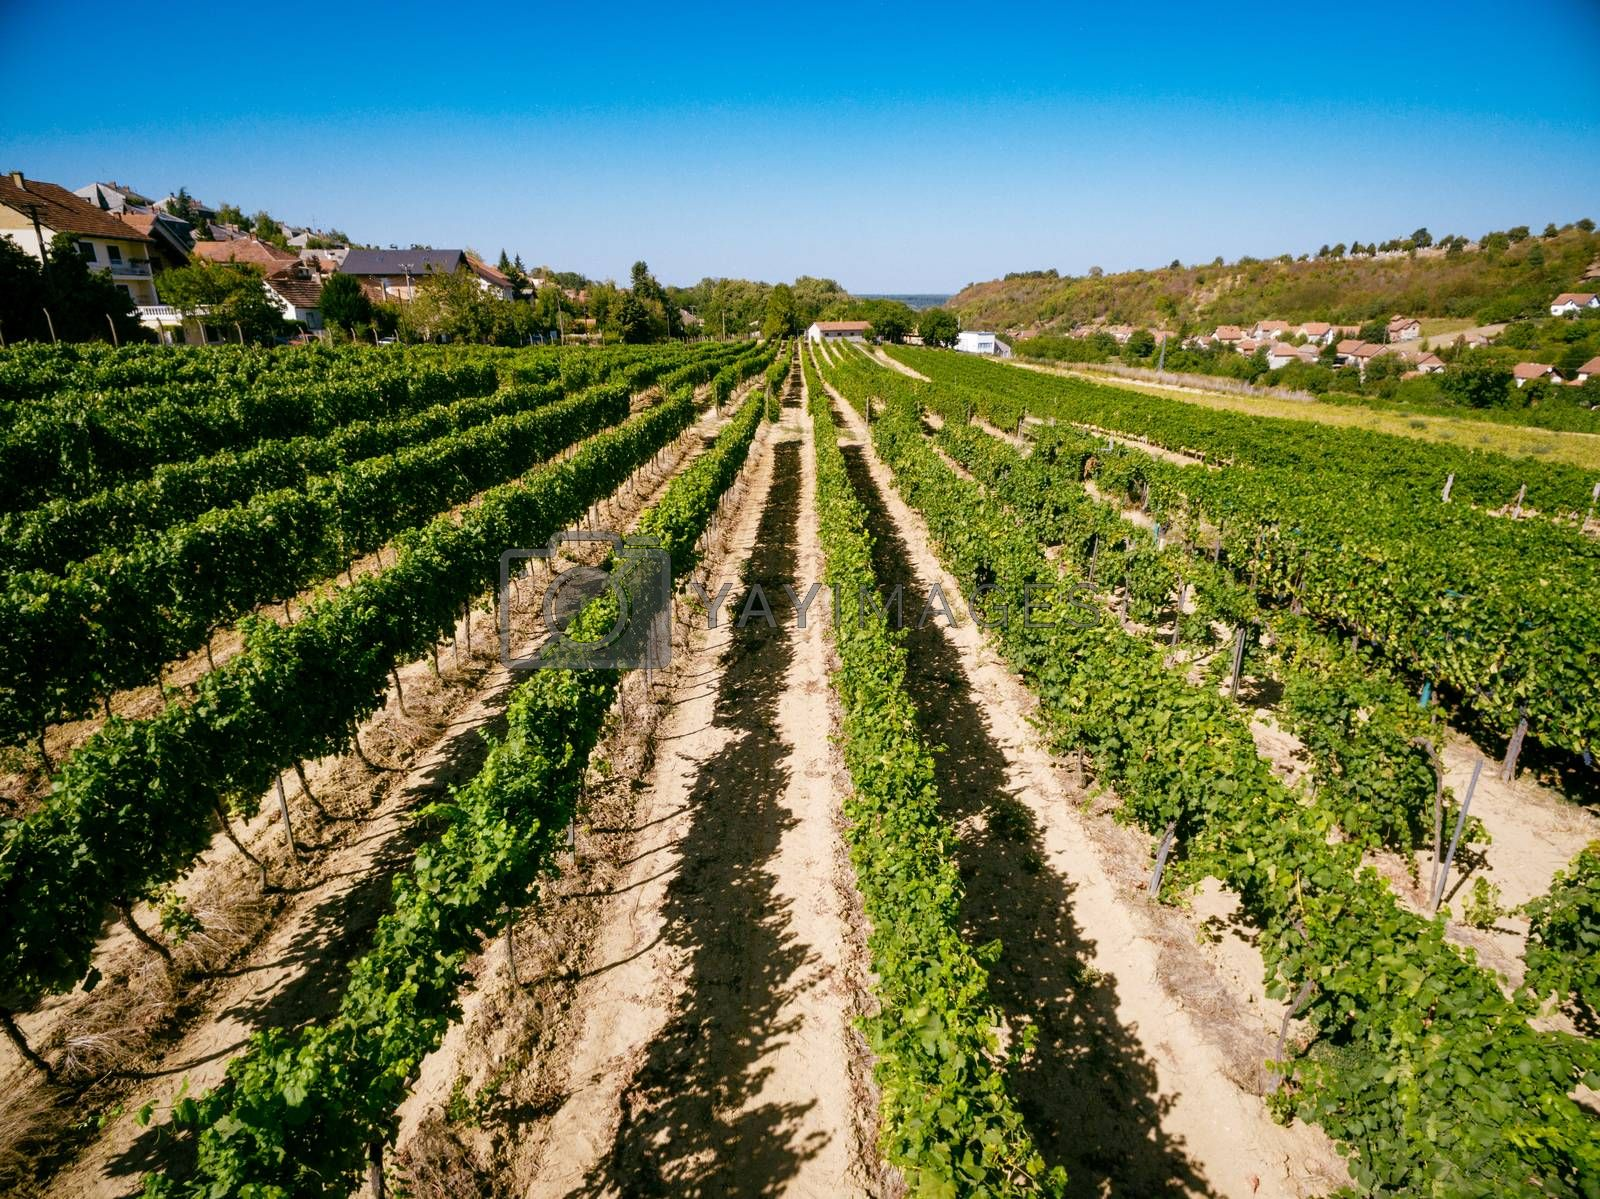 Beautiful vineyard landscape on sunny day.